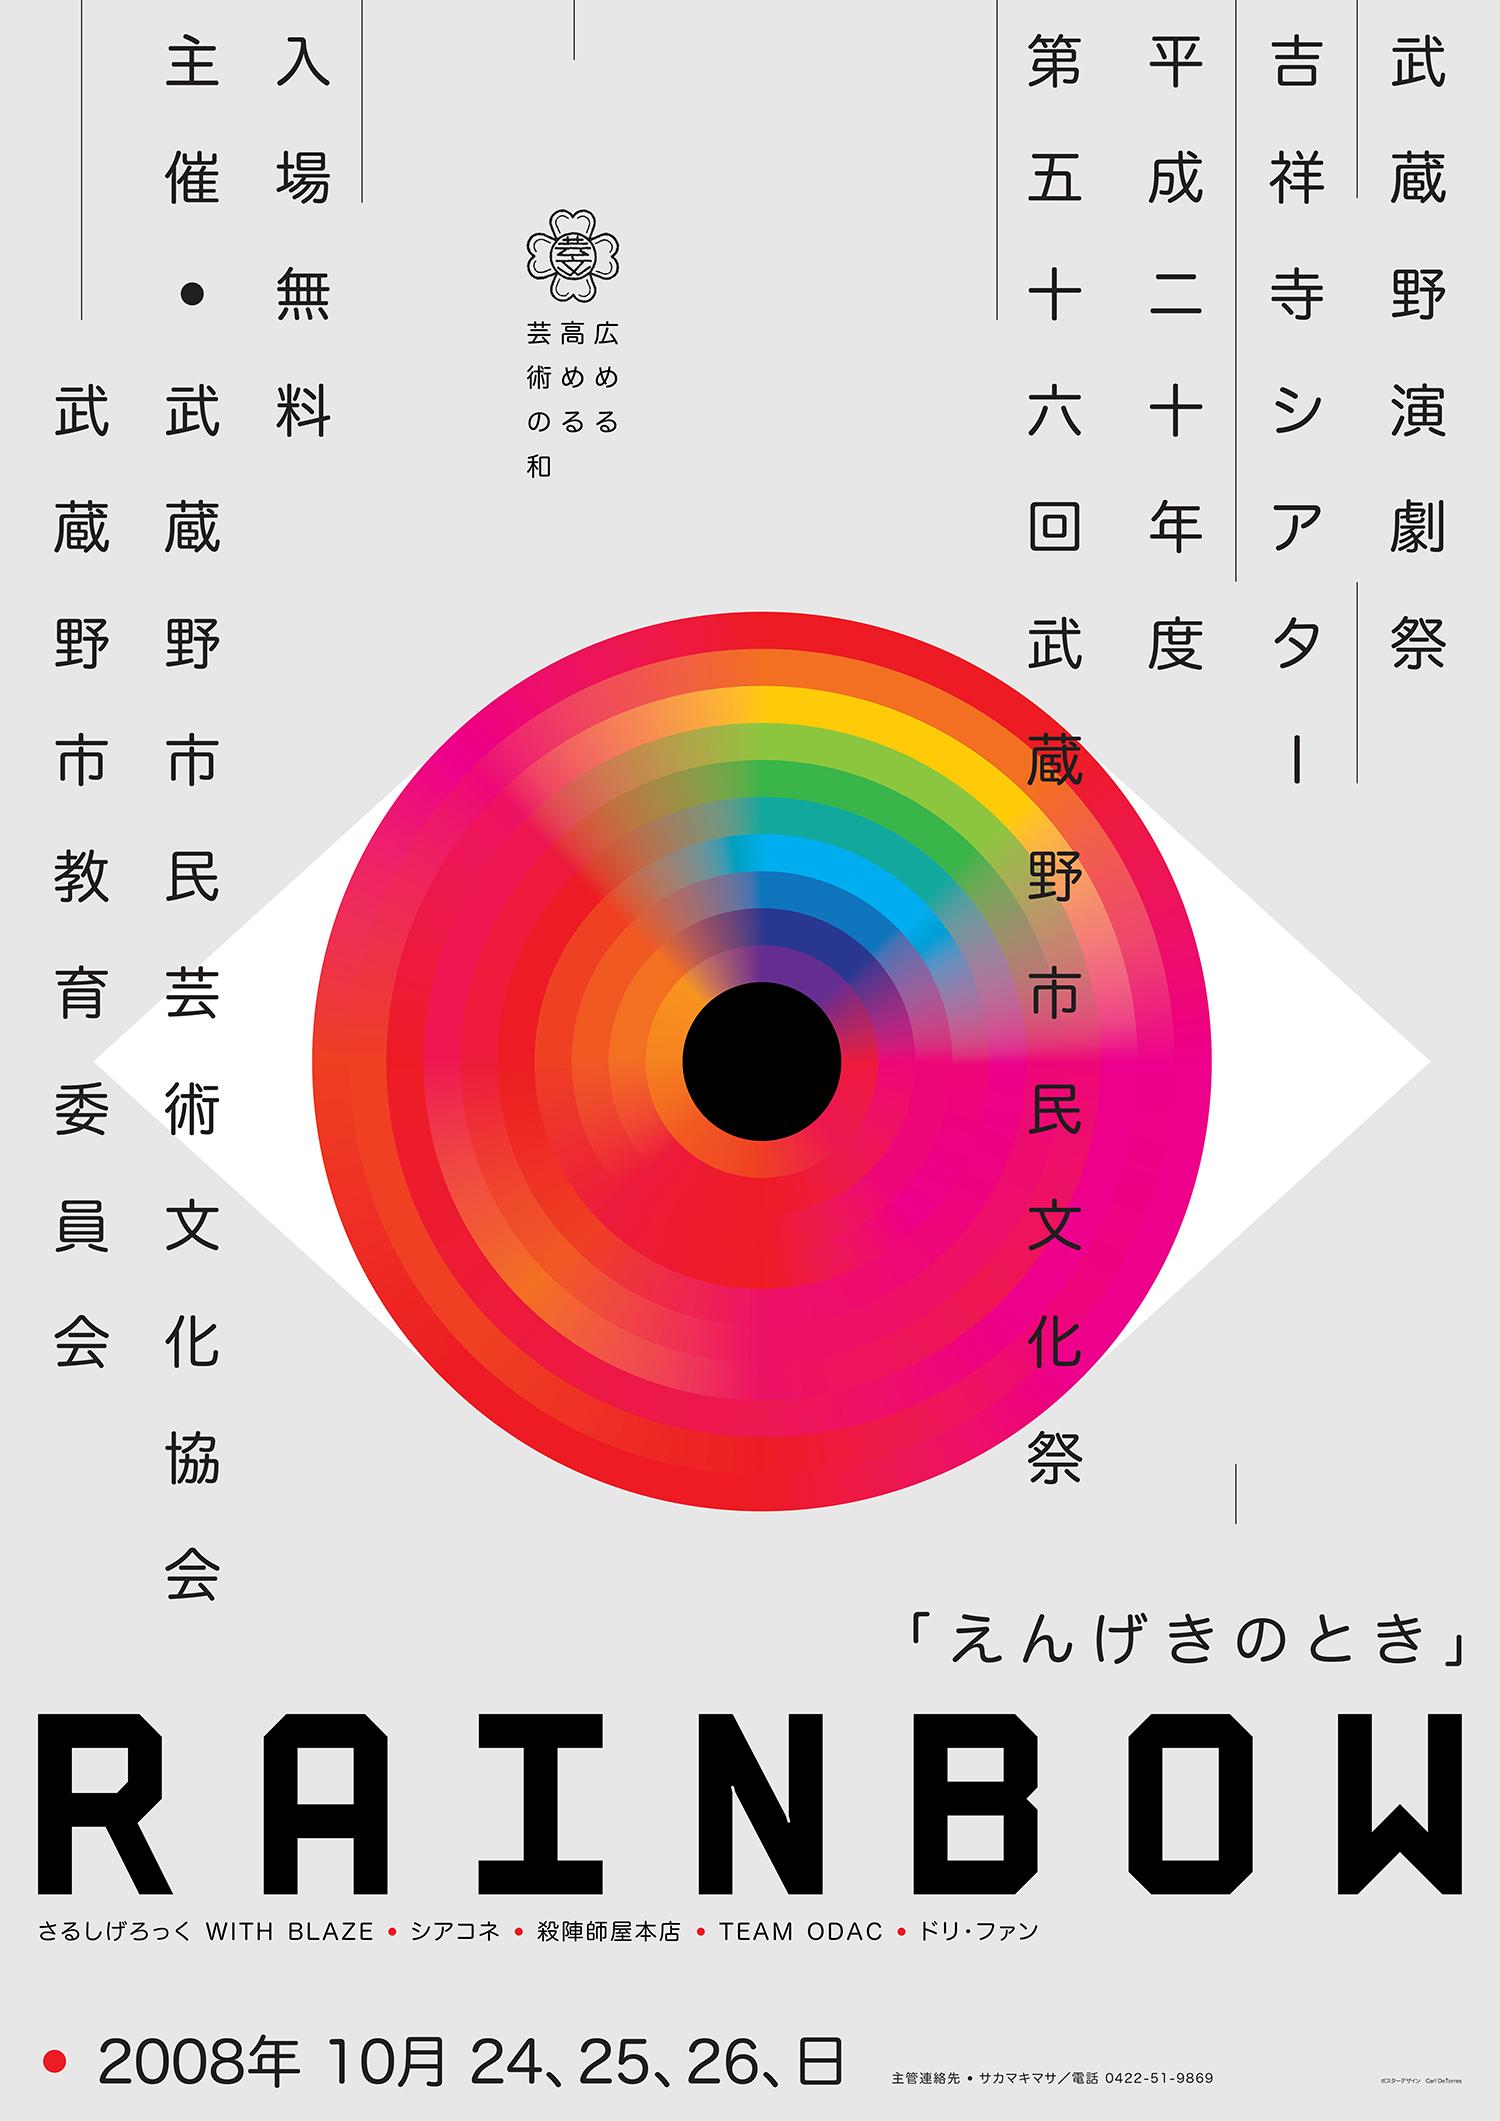 Optimized_CDT_Rainbow_Poster_Final.jpg